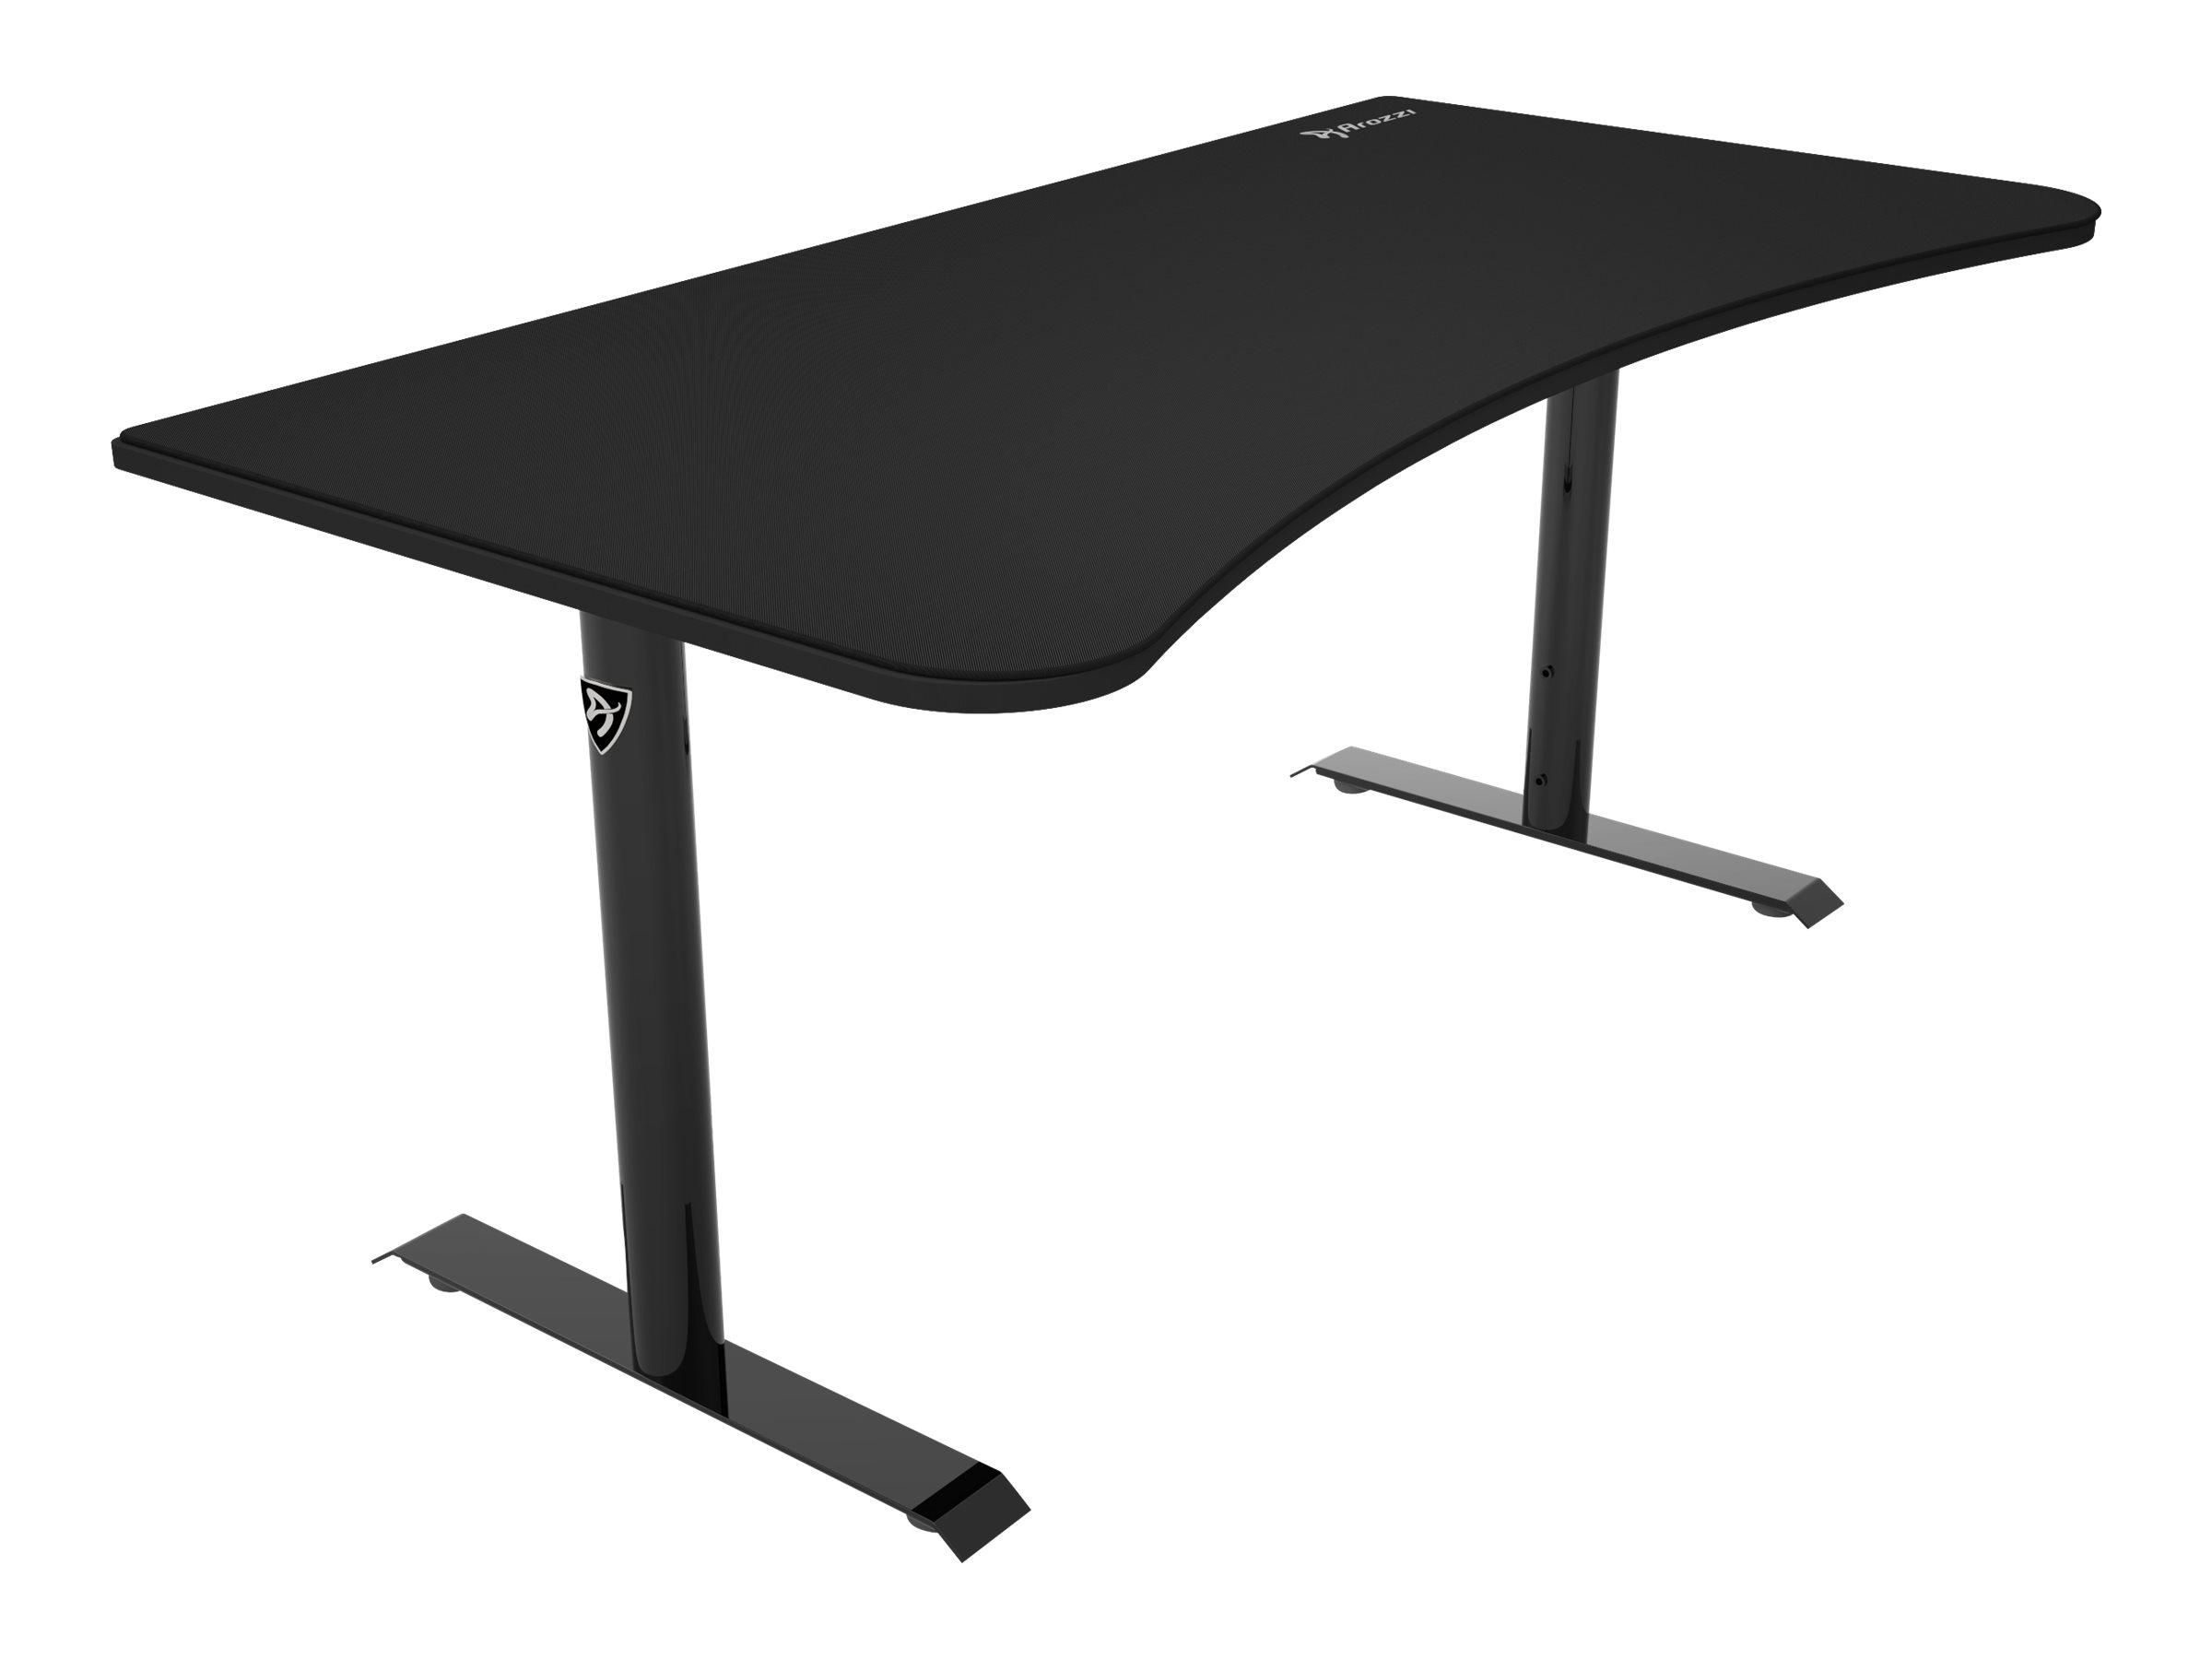 Arozzi Arena - Tisch - gebogen - Pure Black